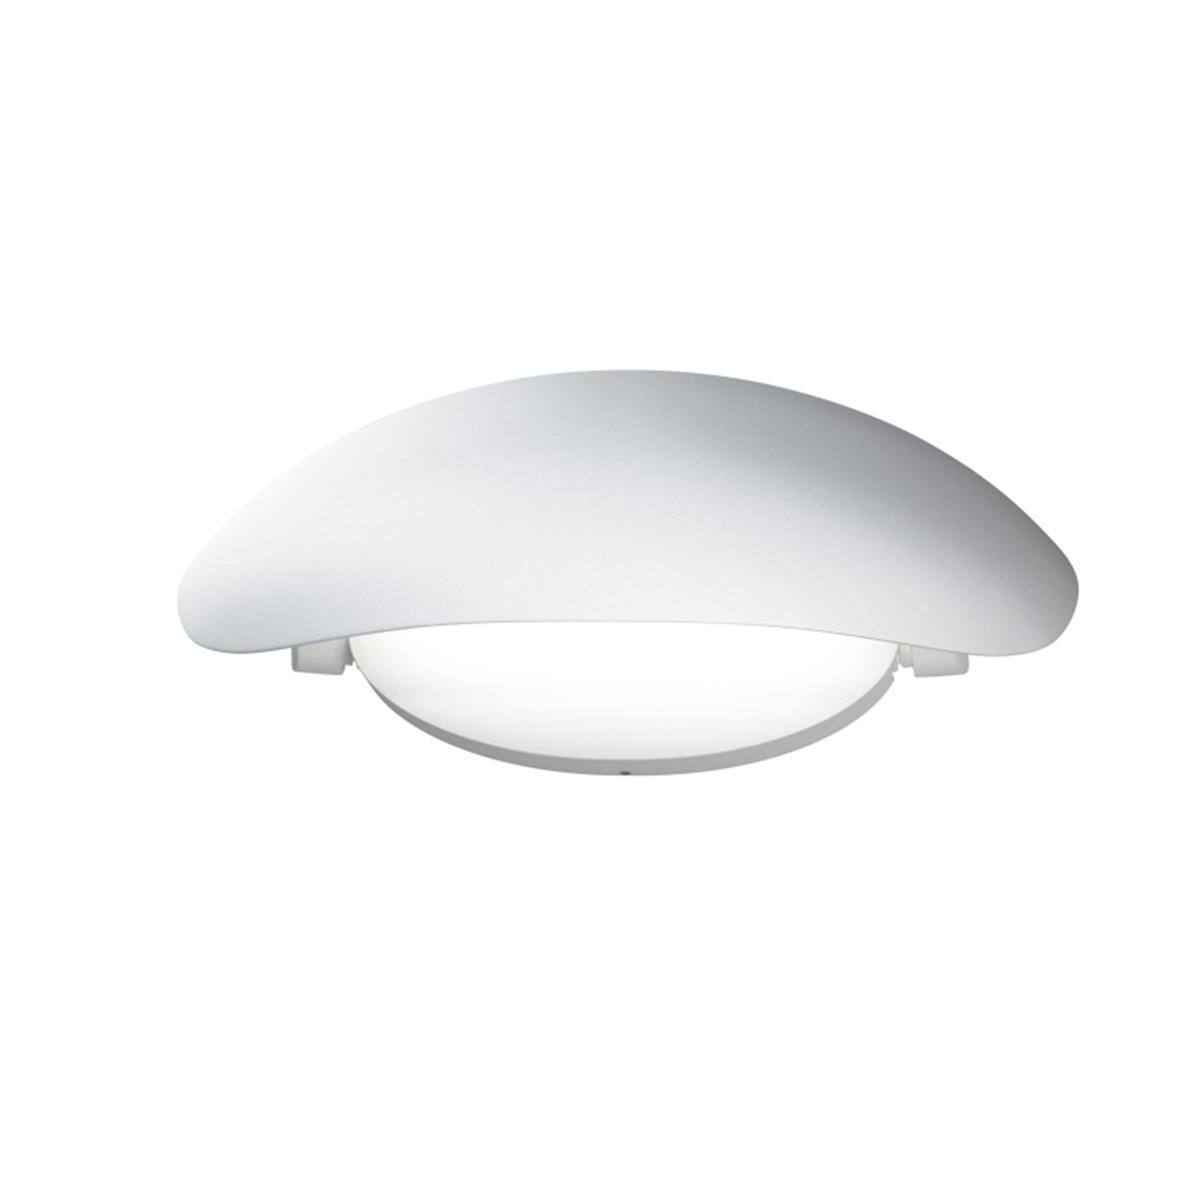 osram endura style led cover oval 12 watt leuchte wei 340 lumen warm white ip44. Black Bedroom Furniture Sets. Home Design Ideas